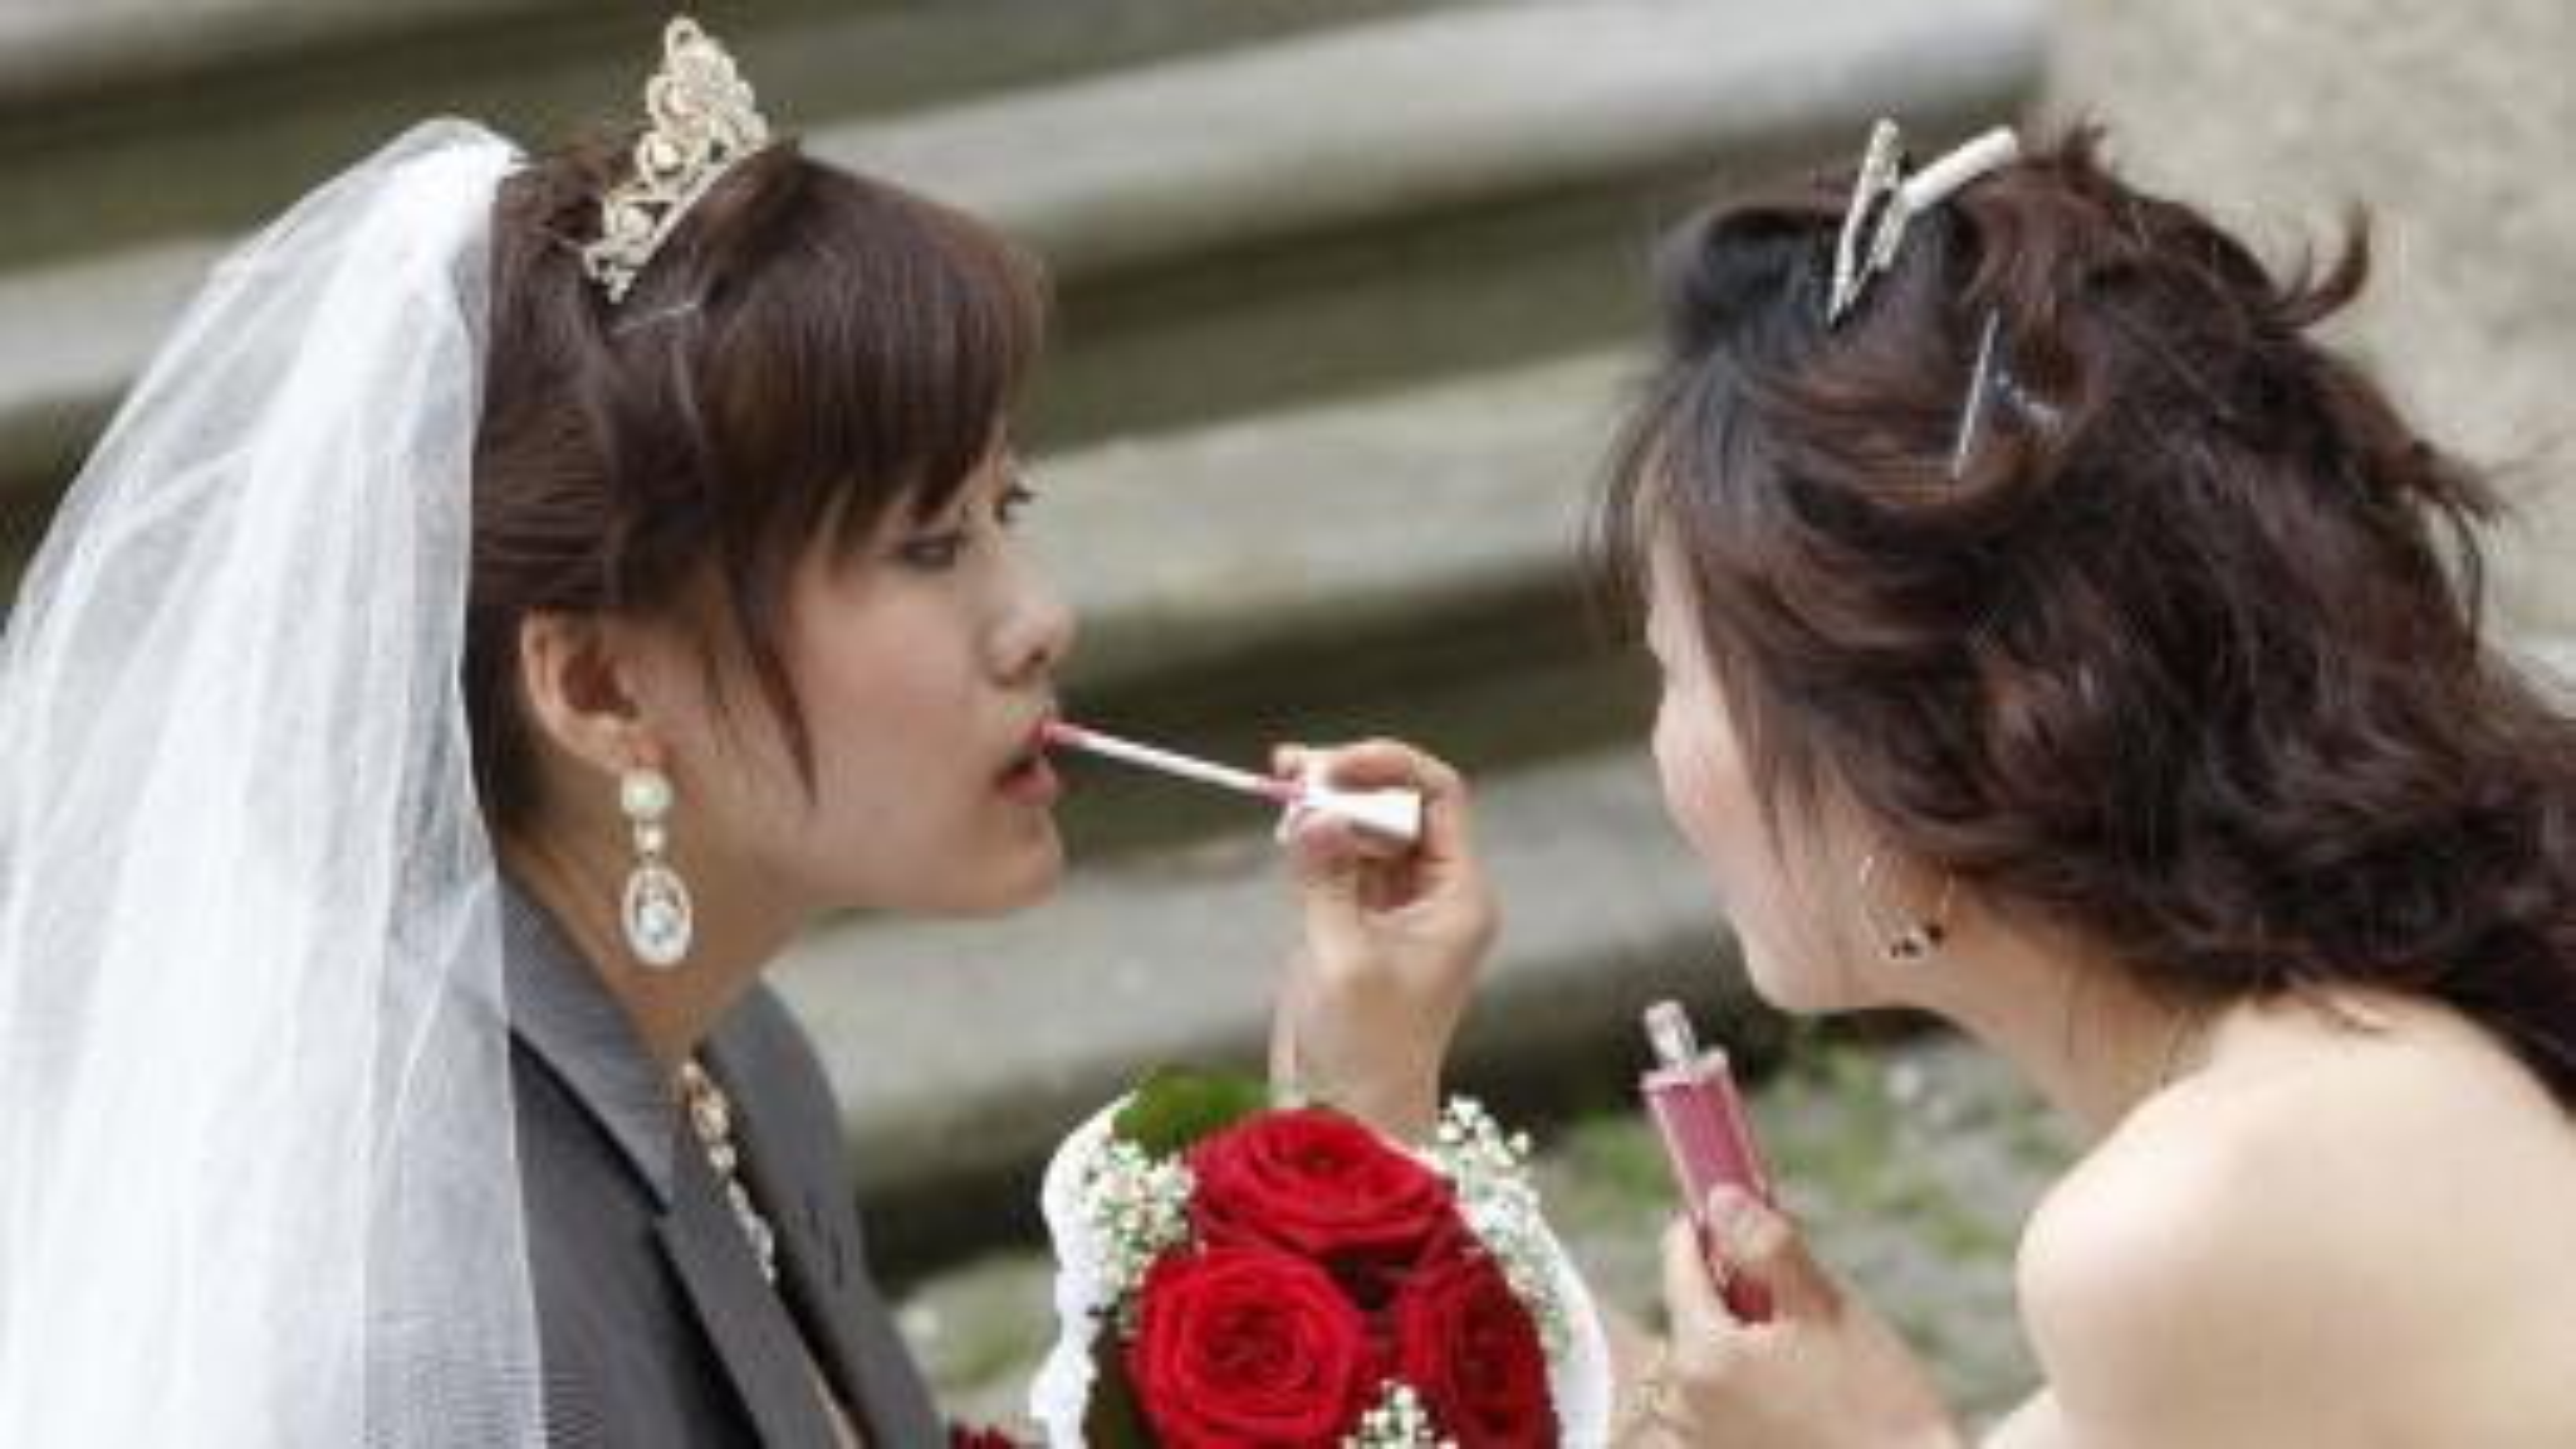 Chinese bride and bridesmaid